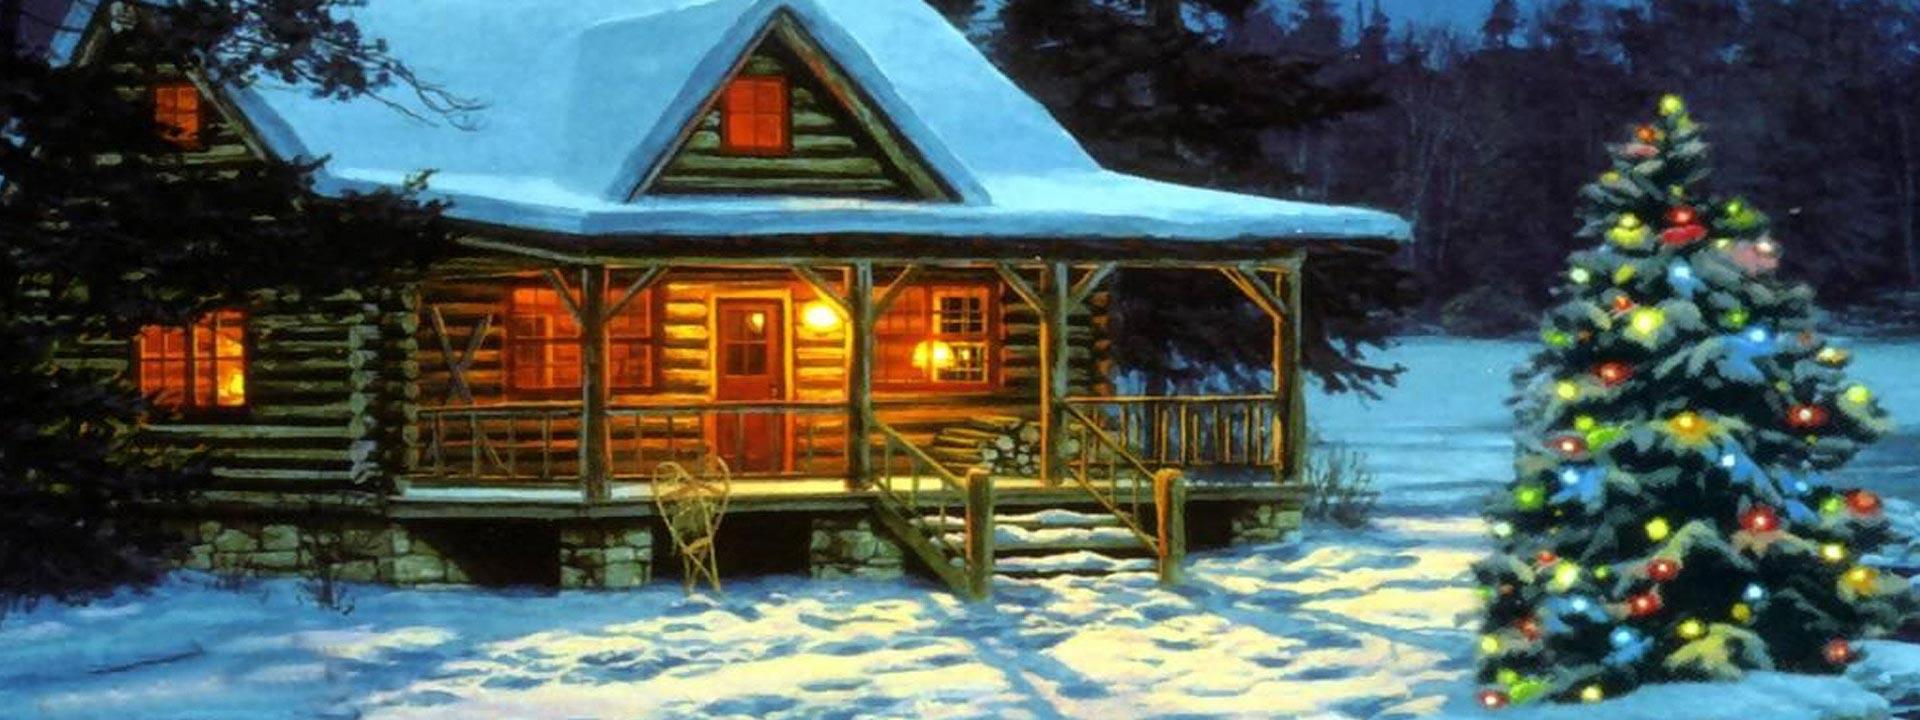 Gatlinburg Christmas.A Smoky Mountain Christmas Gatlinburg Christmas Pigeon